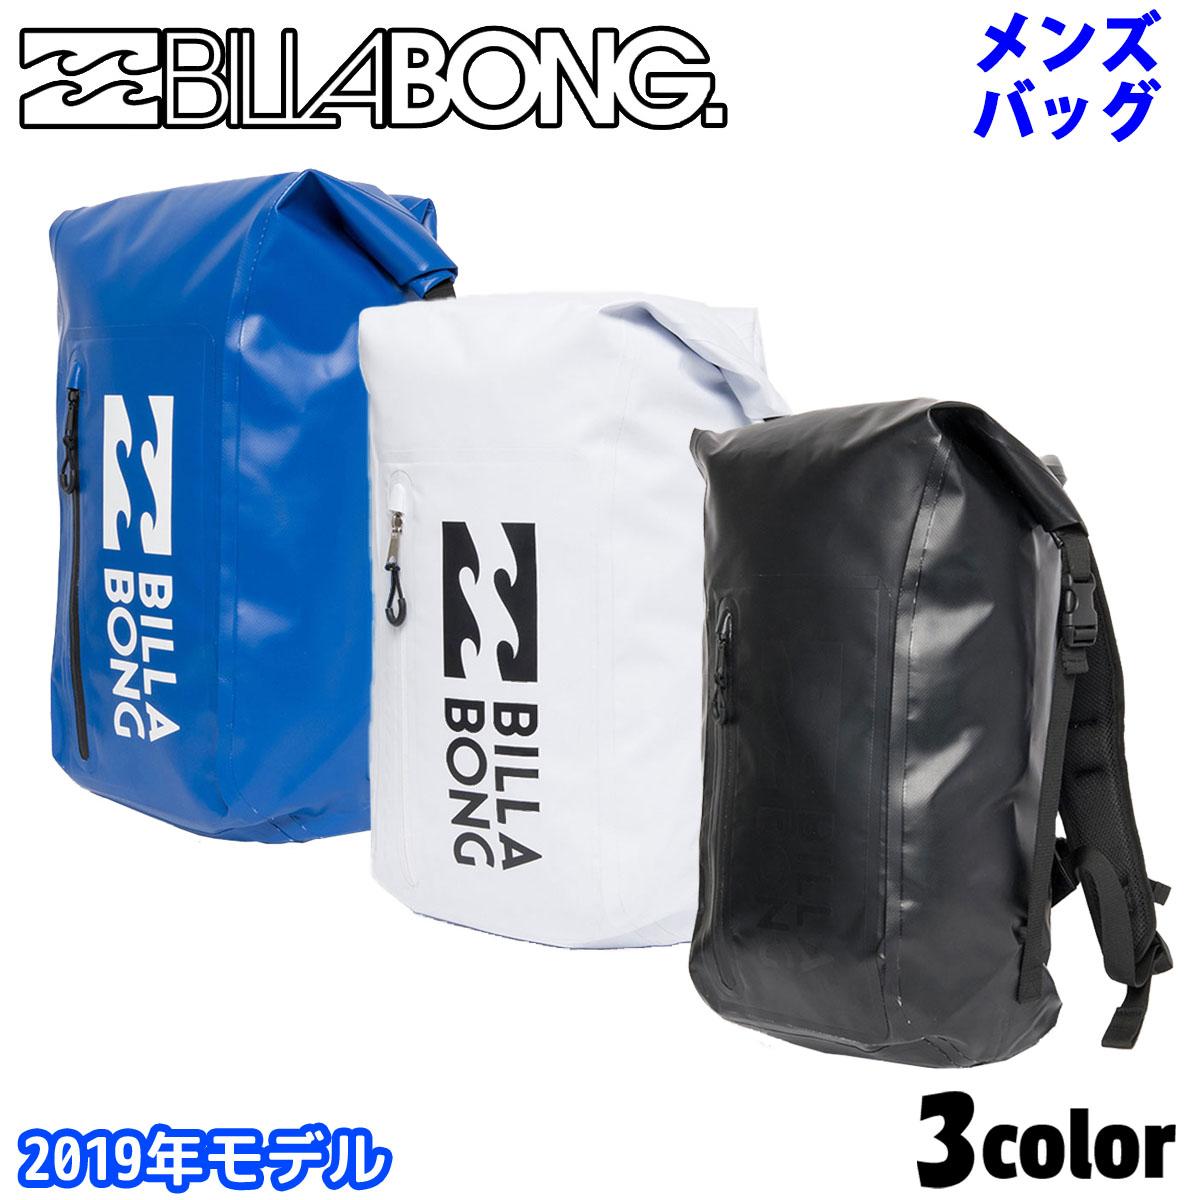 【BILLABONG(ビラボン)】 2019年春夏モデル バッグ 17L メンズ WET ROLL RUCK 品番:AJ011-937 日本正規品